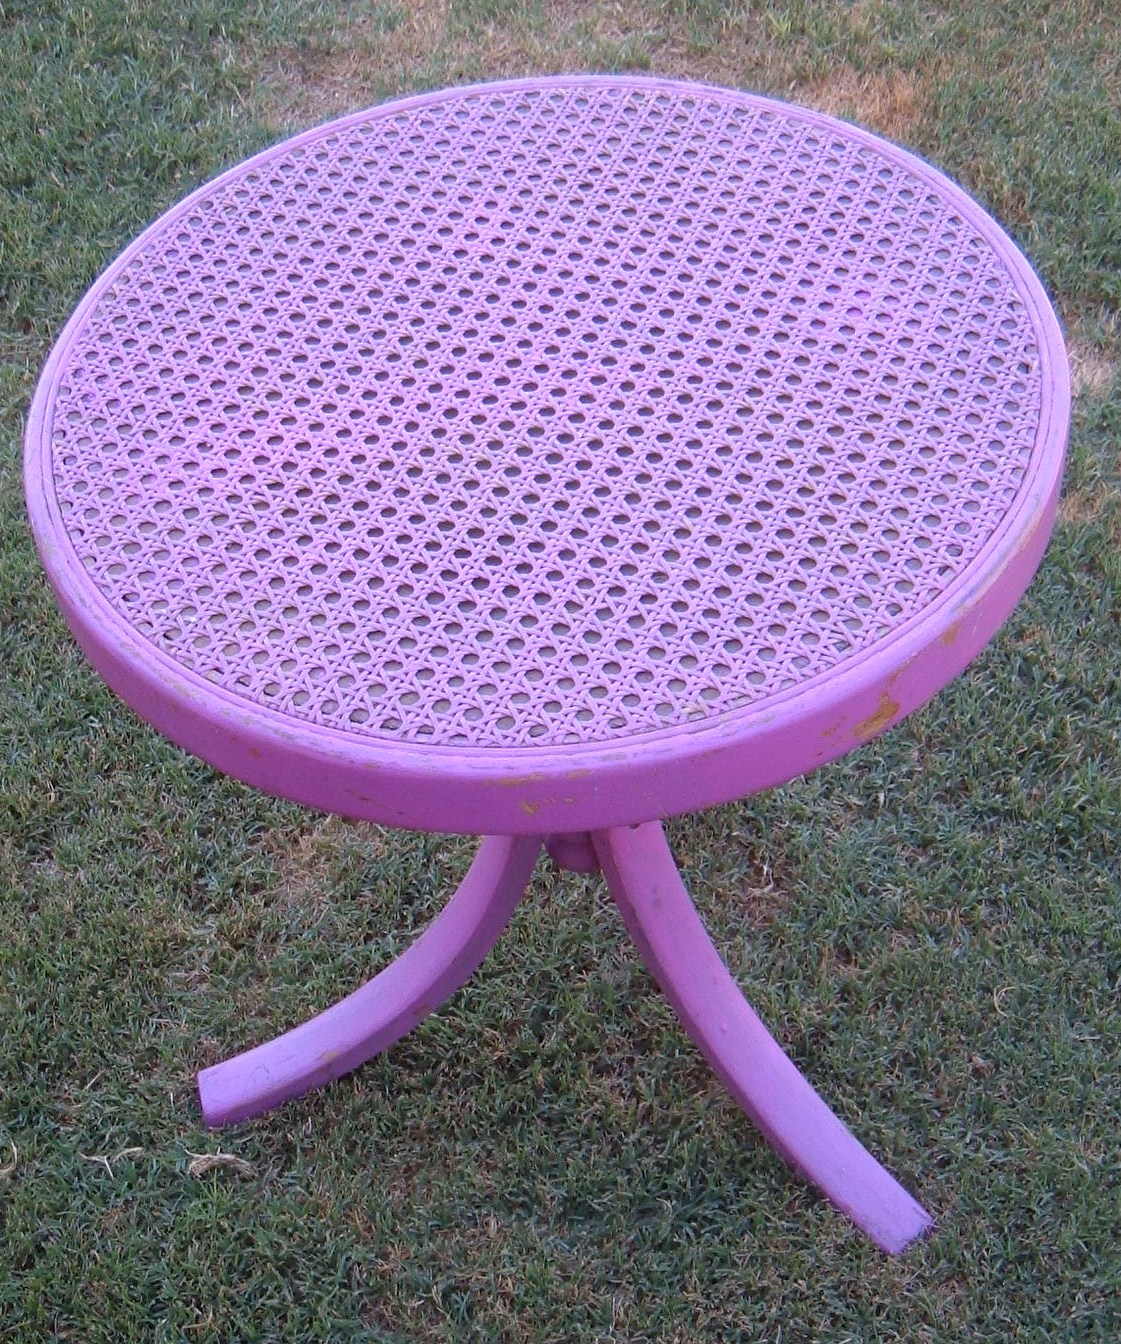 spanky luvs vintage shake your money maker norma jean baker recycled table. Black Bedroom Furniture Sets. Home Design Ideas